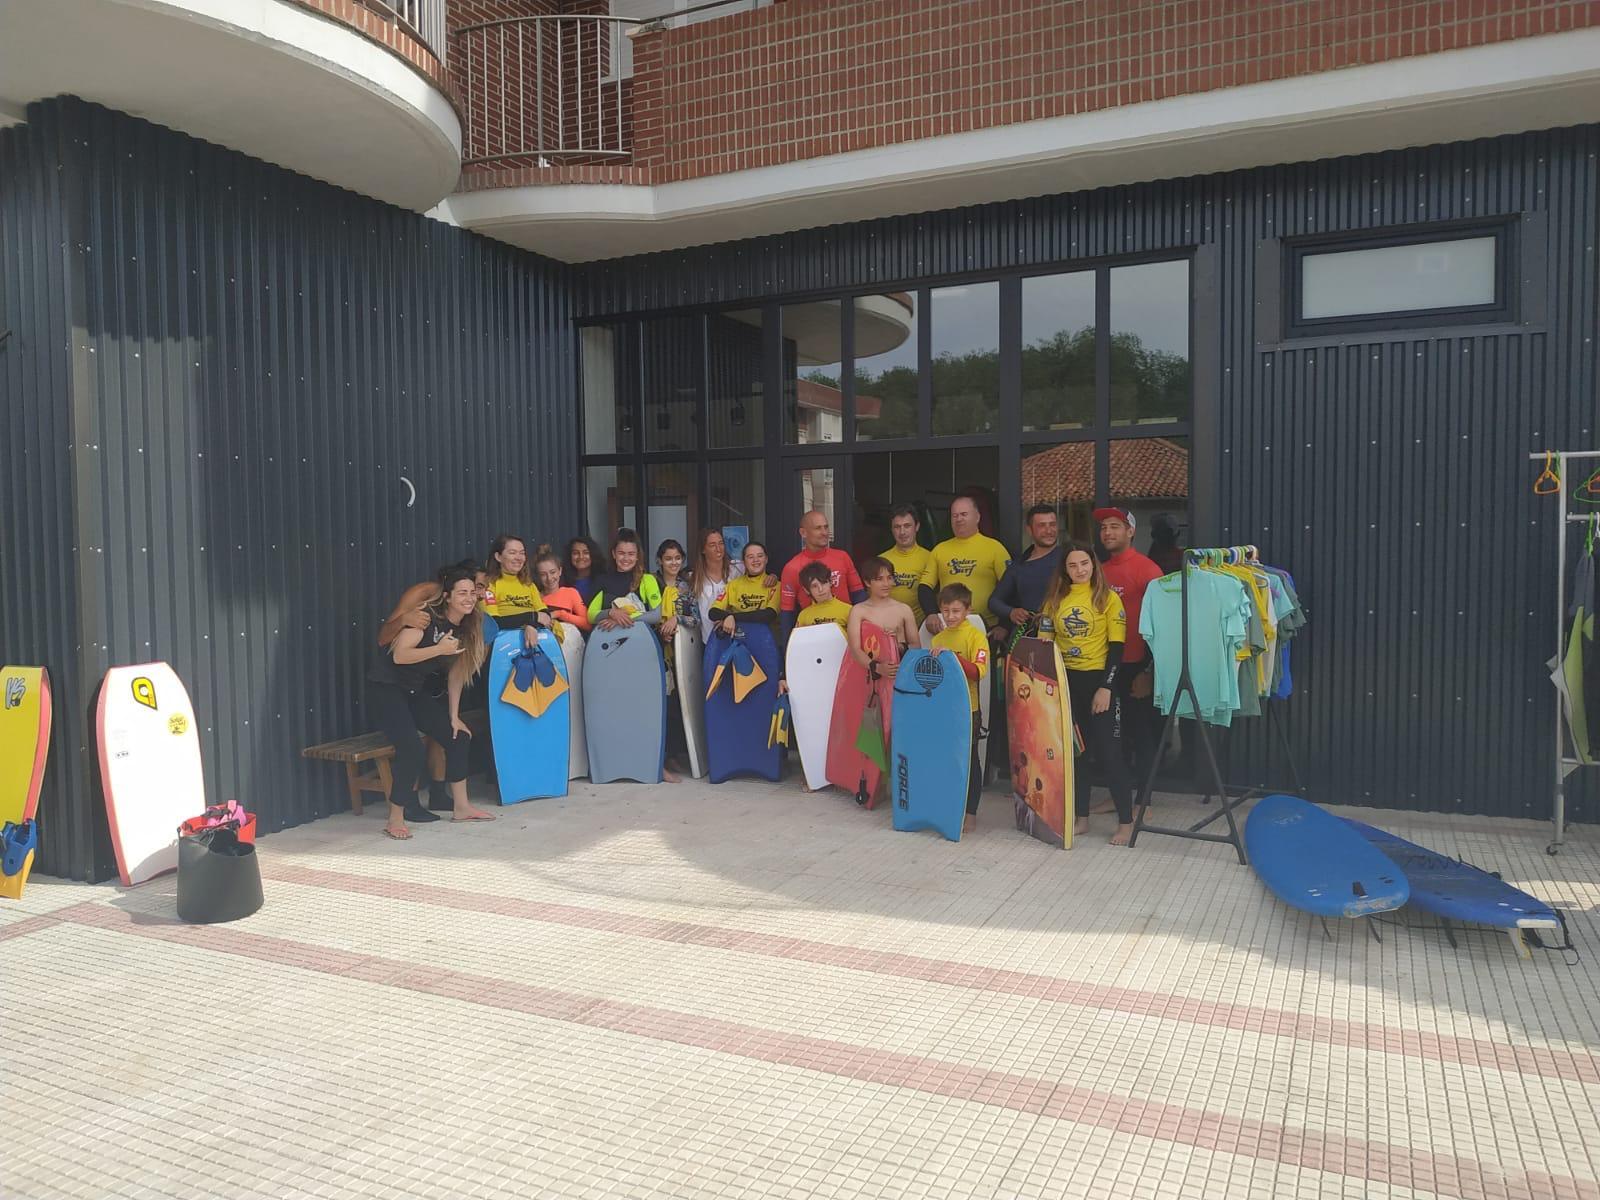 solarsurfschool 19